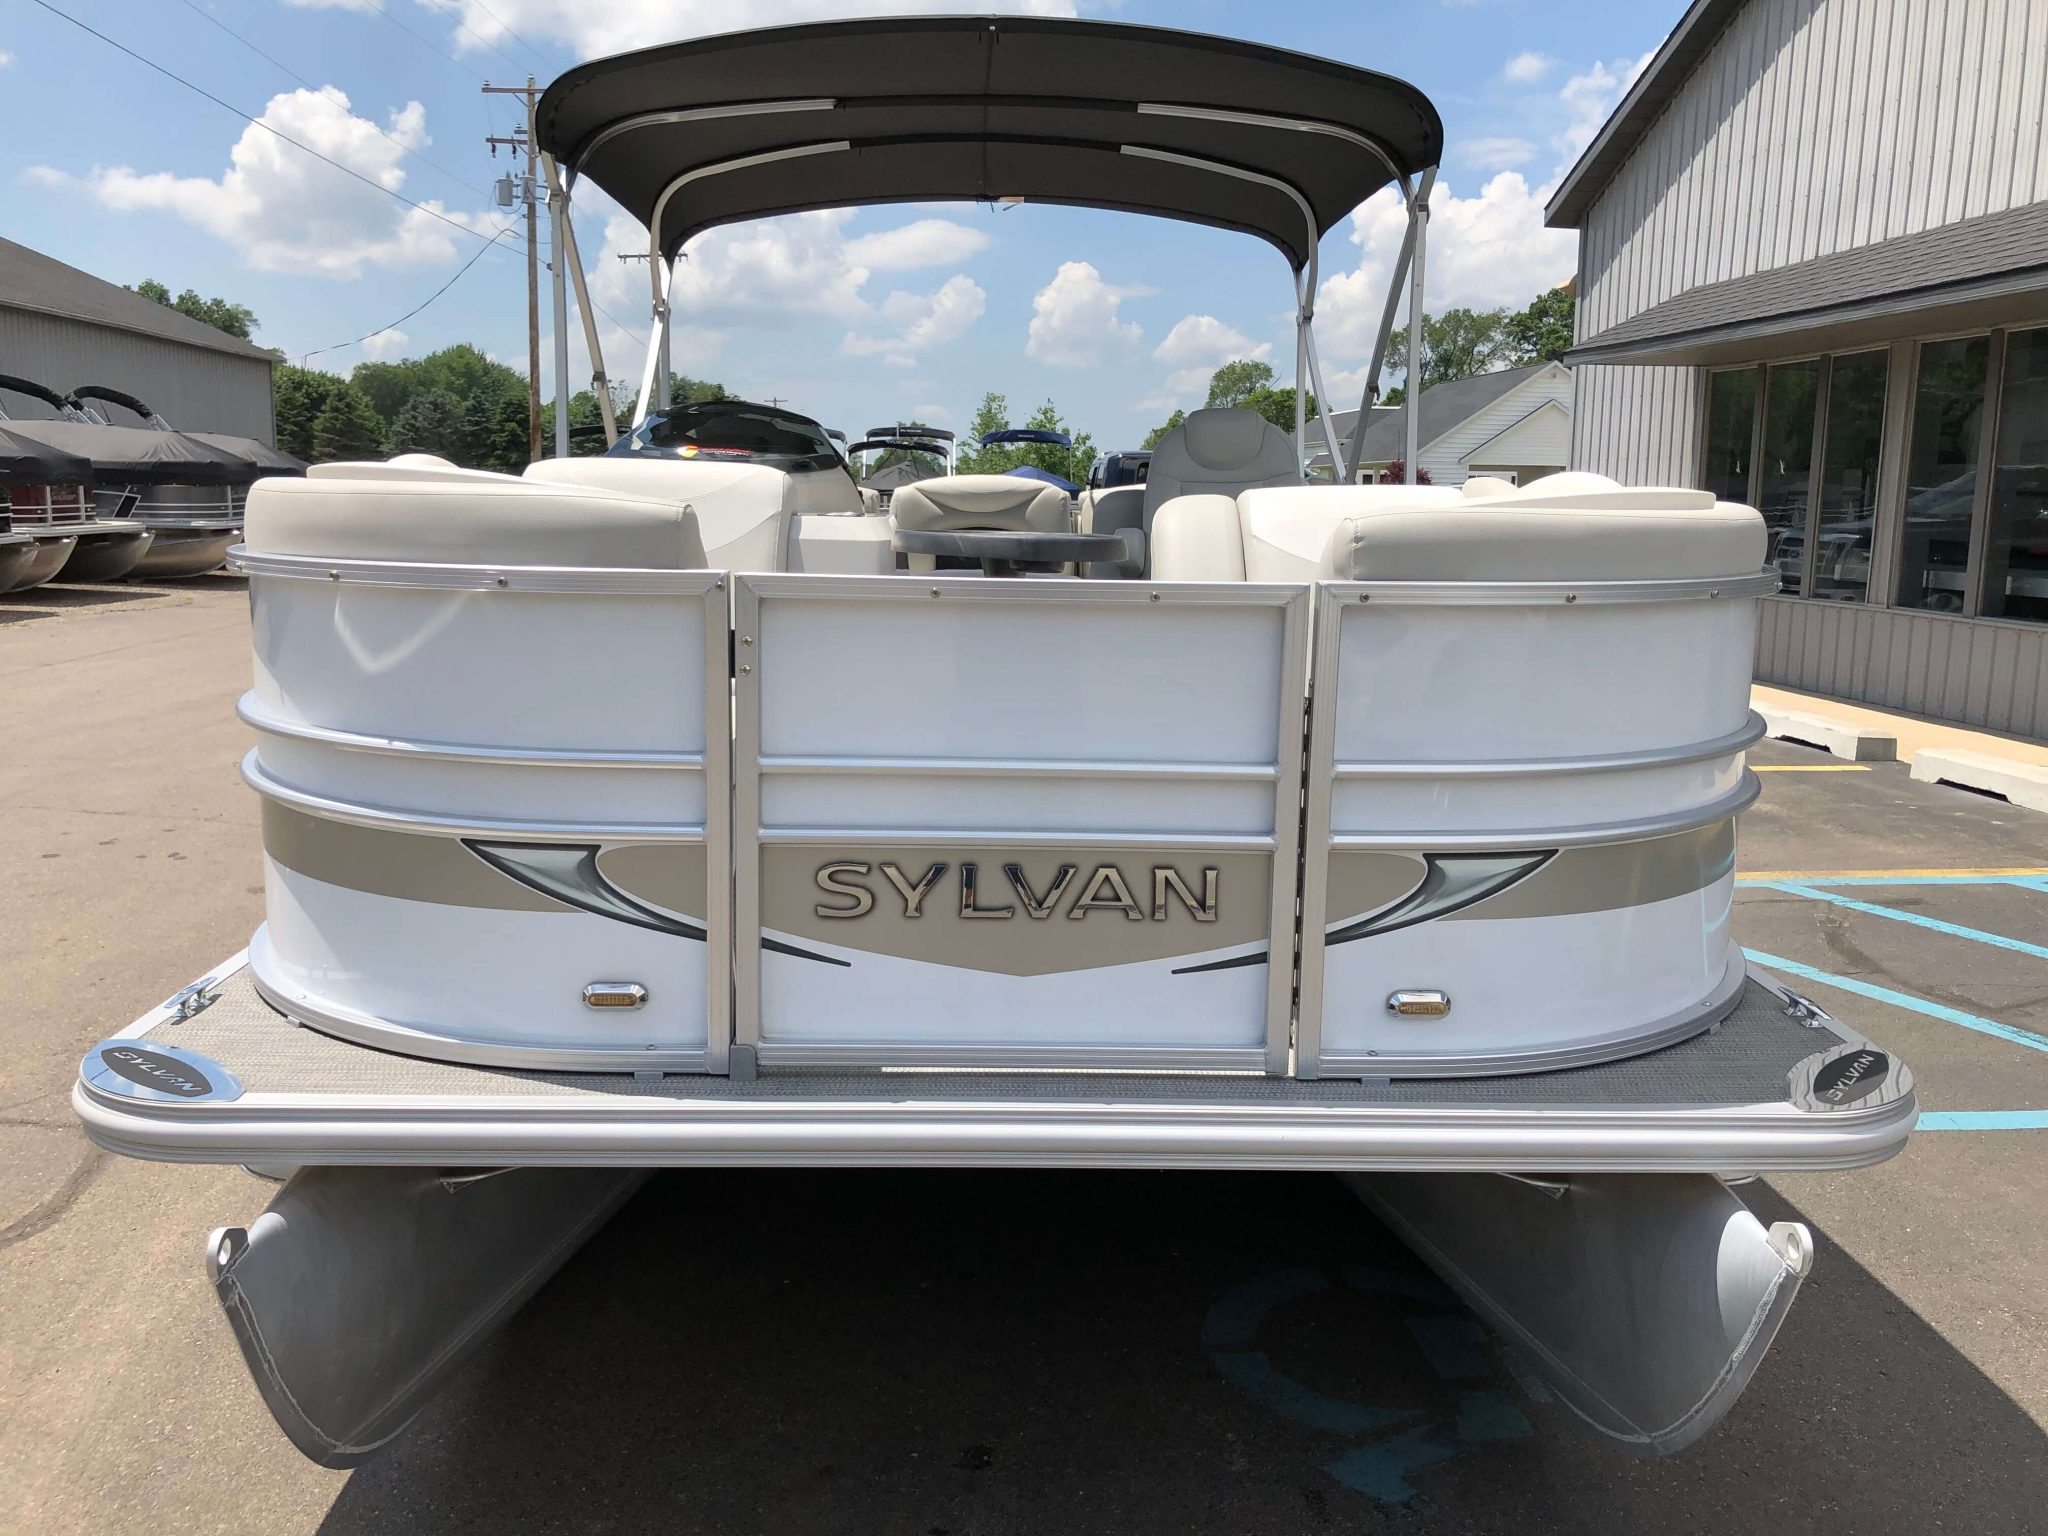 2016 Sylvan 8520 LZ LES Pontoon Boat 6